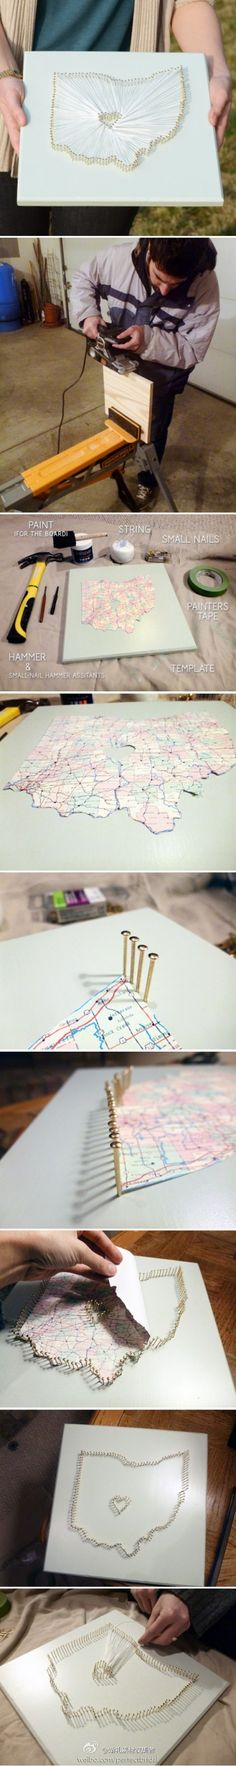 DIY map heart